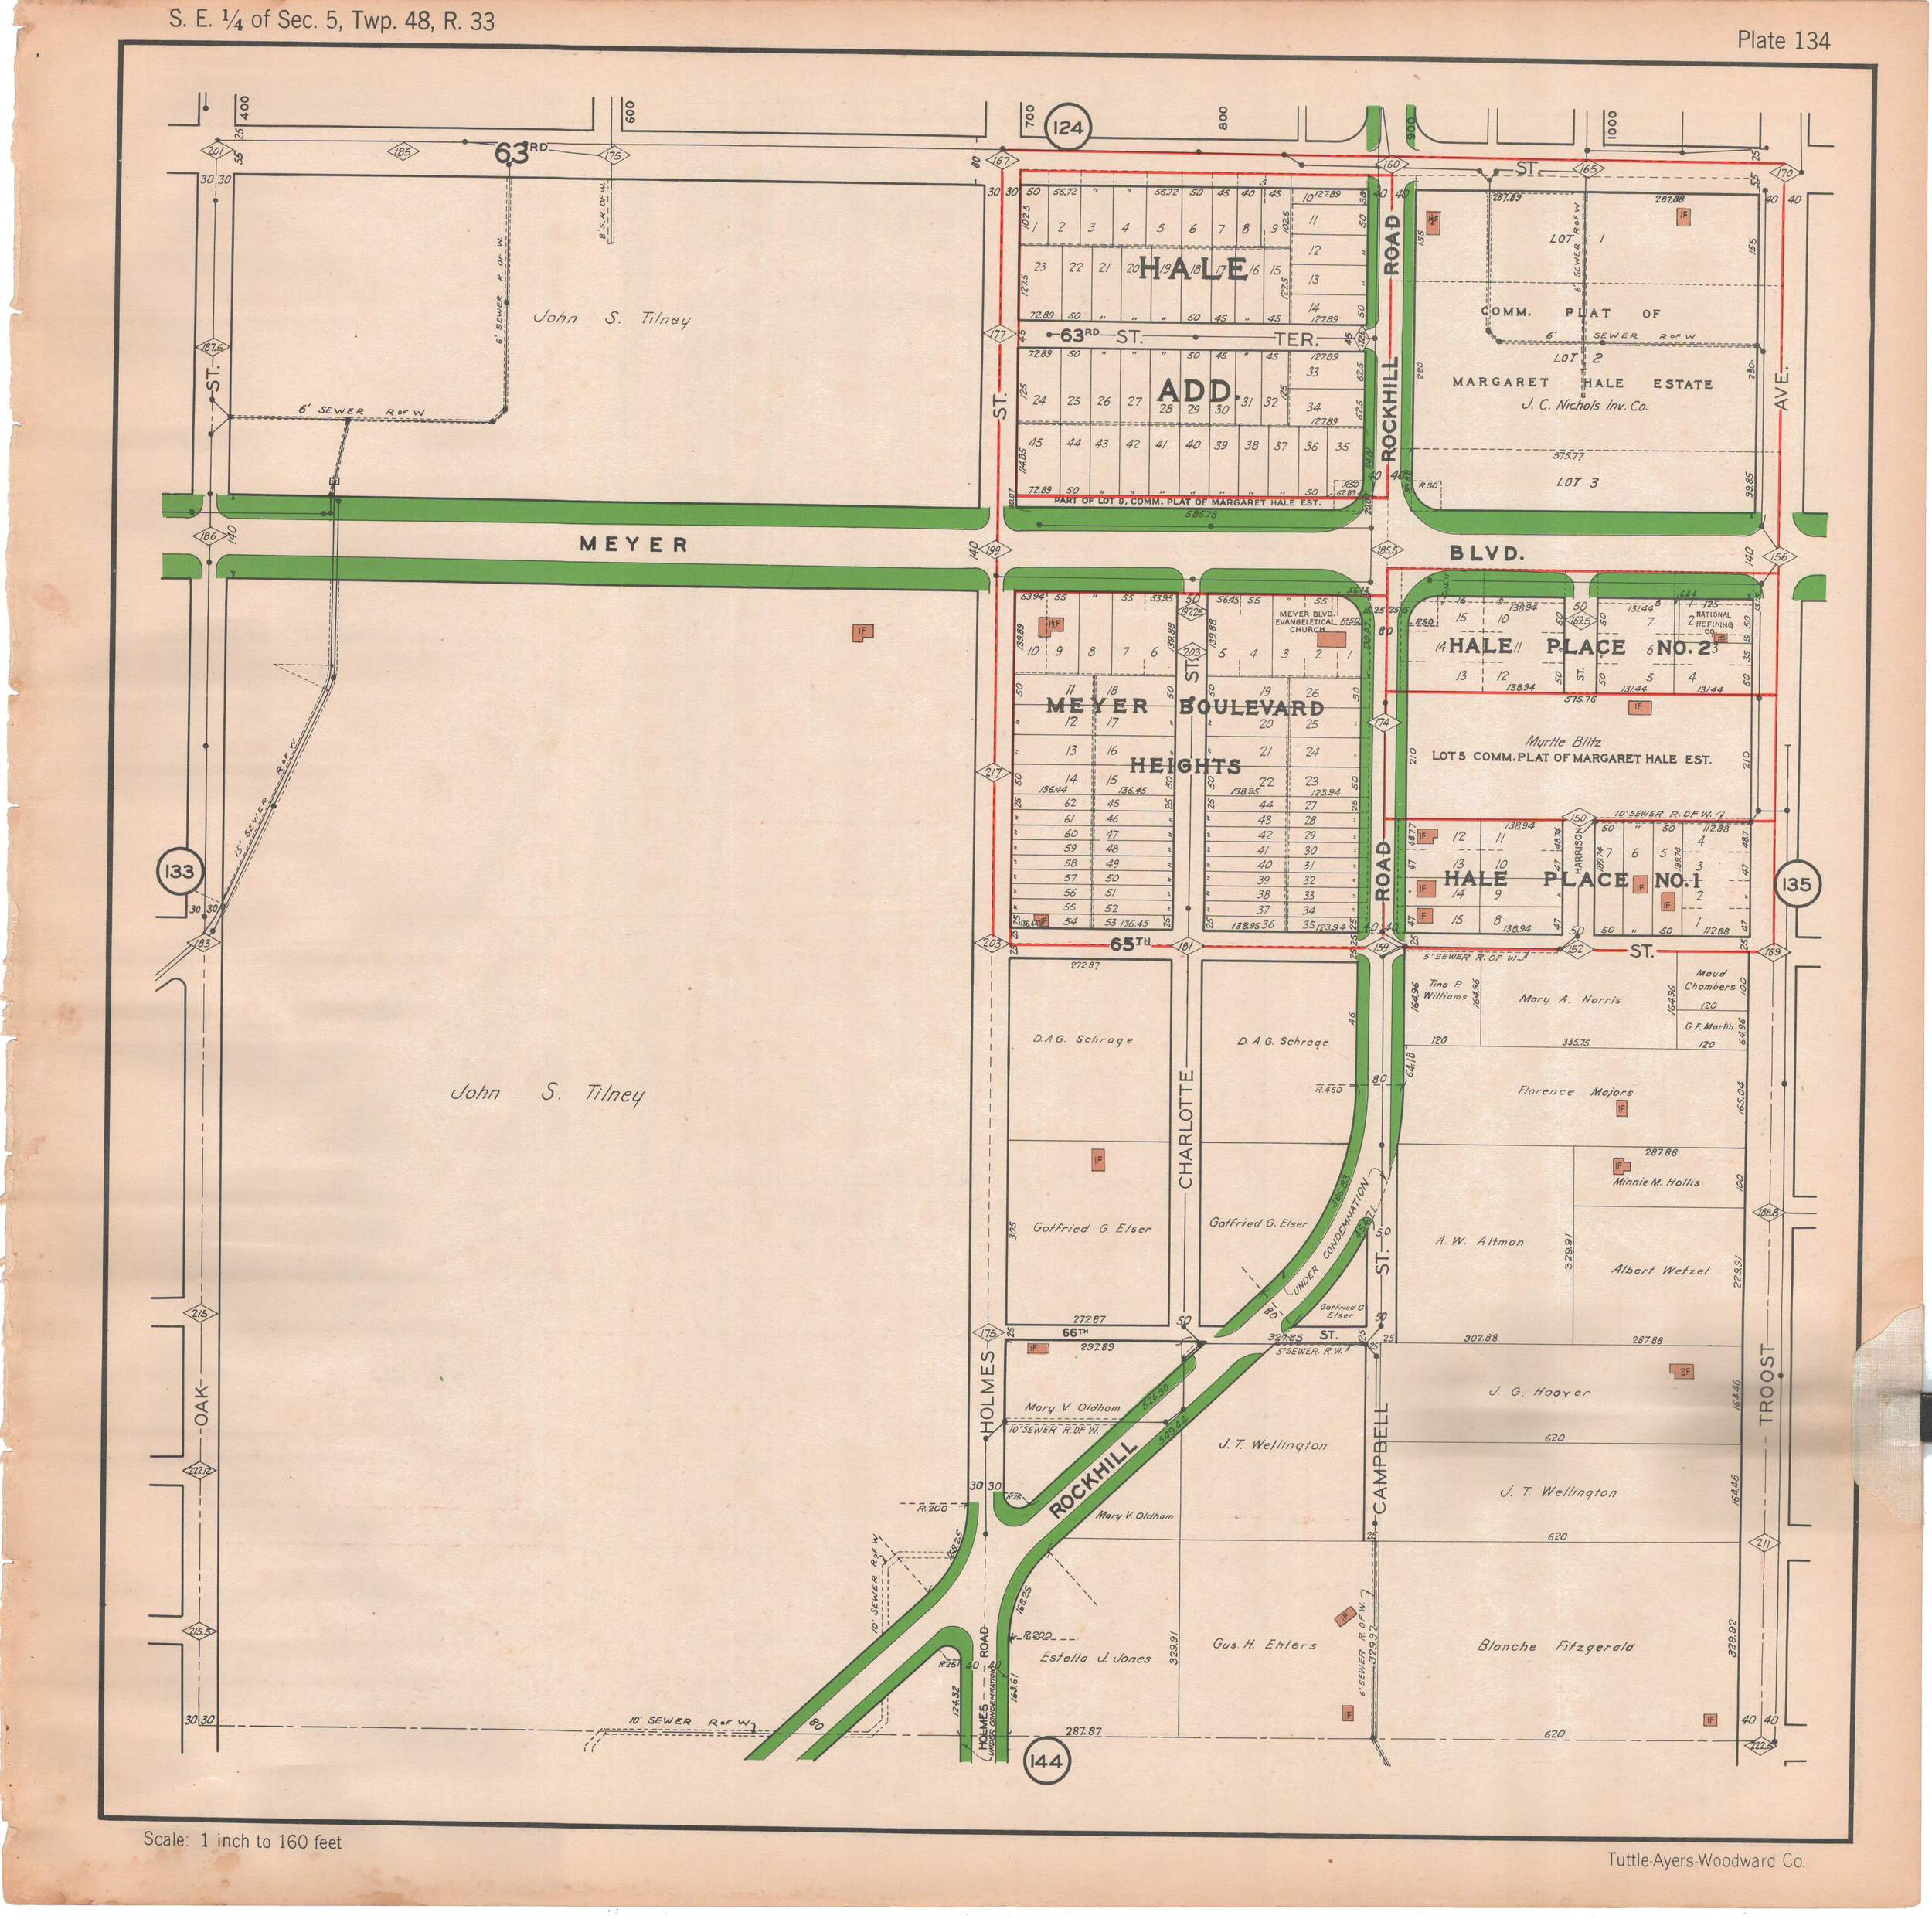 1925 TUTTLE_AYERS_Plate_134.JPG